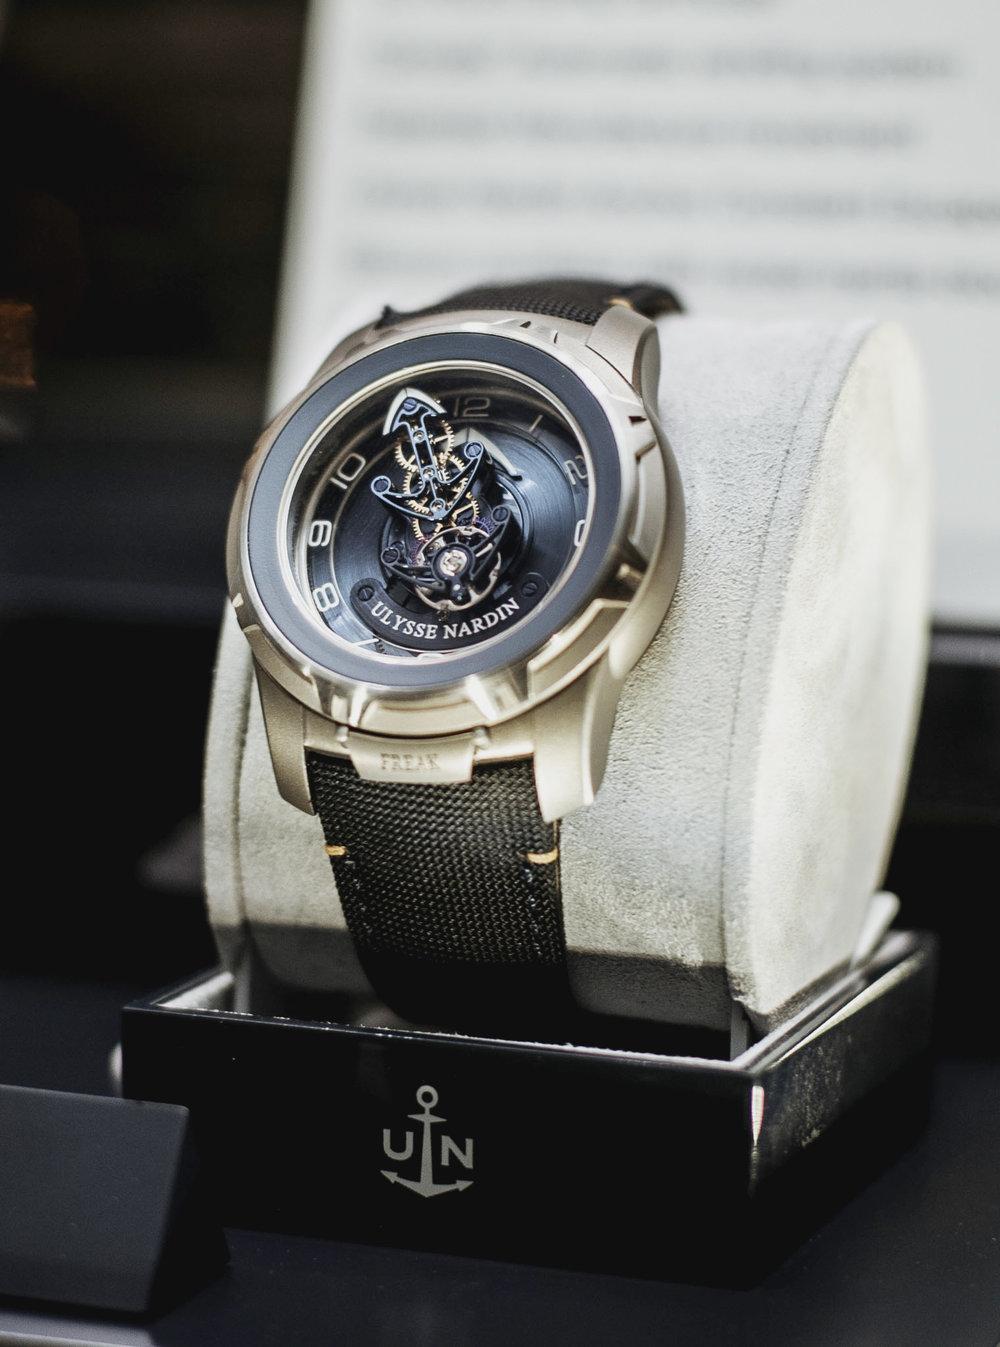 UNroyaljewelers787.JPG